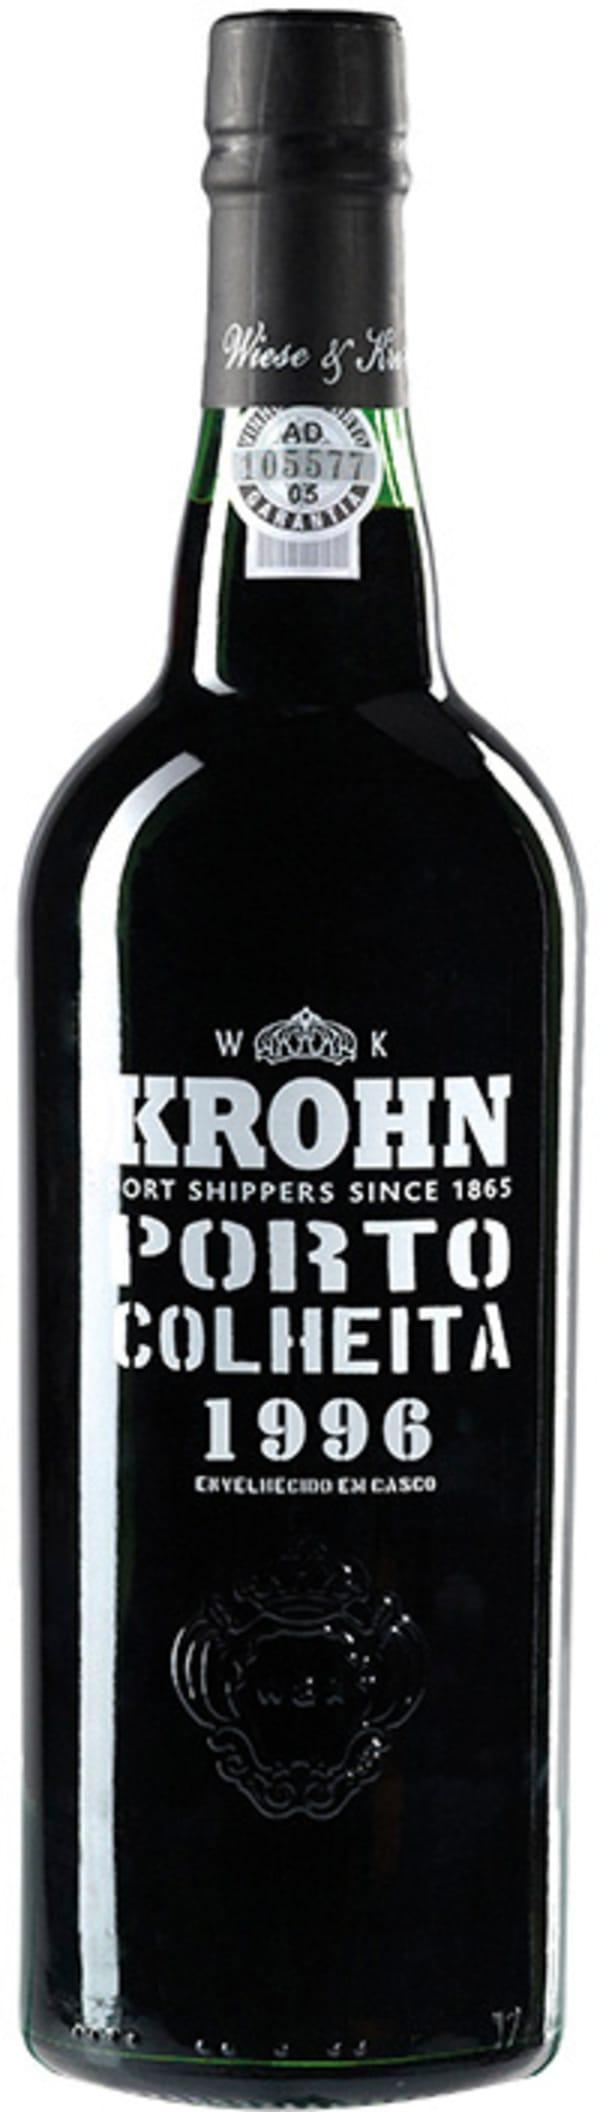 Krohn Porto Colheita 1996